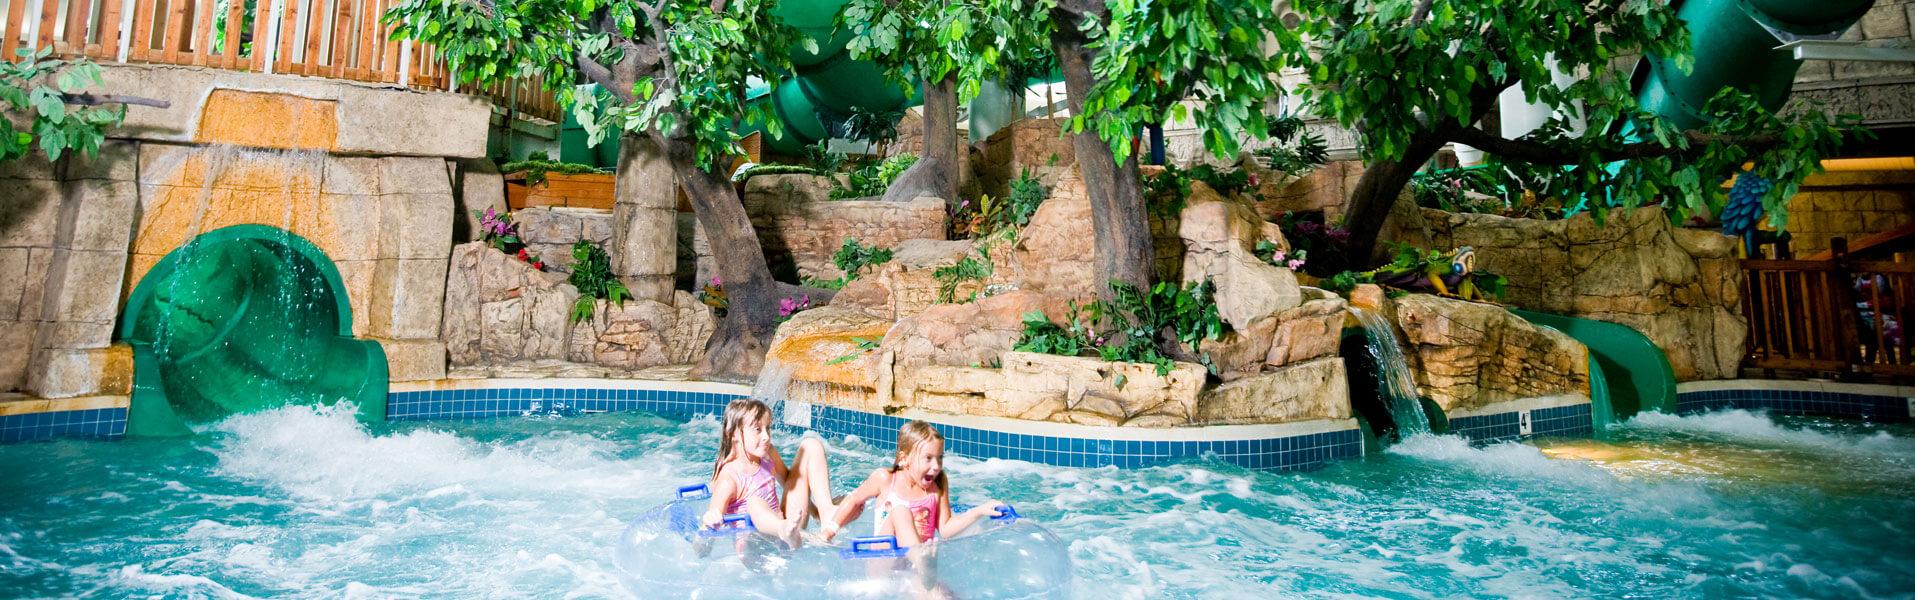 Mt Olympus Indoor Water Park Wisconsin Dells Mt Olympus Resort